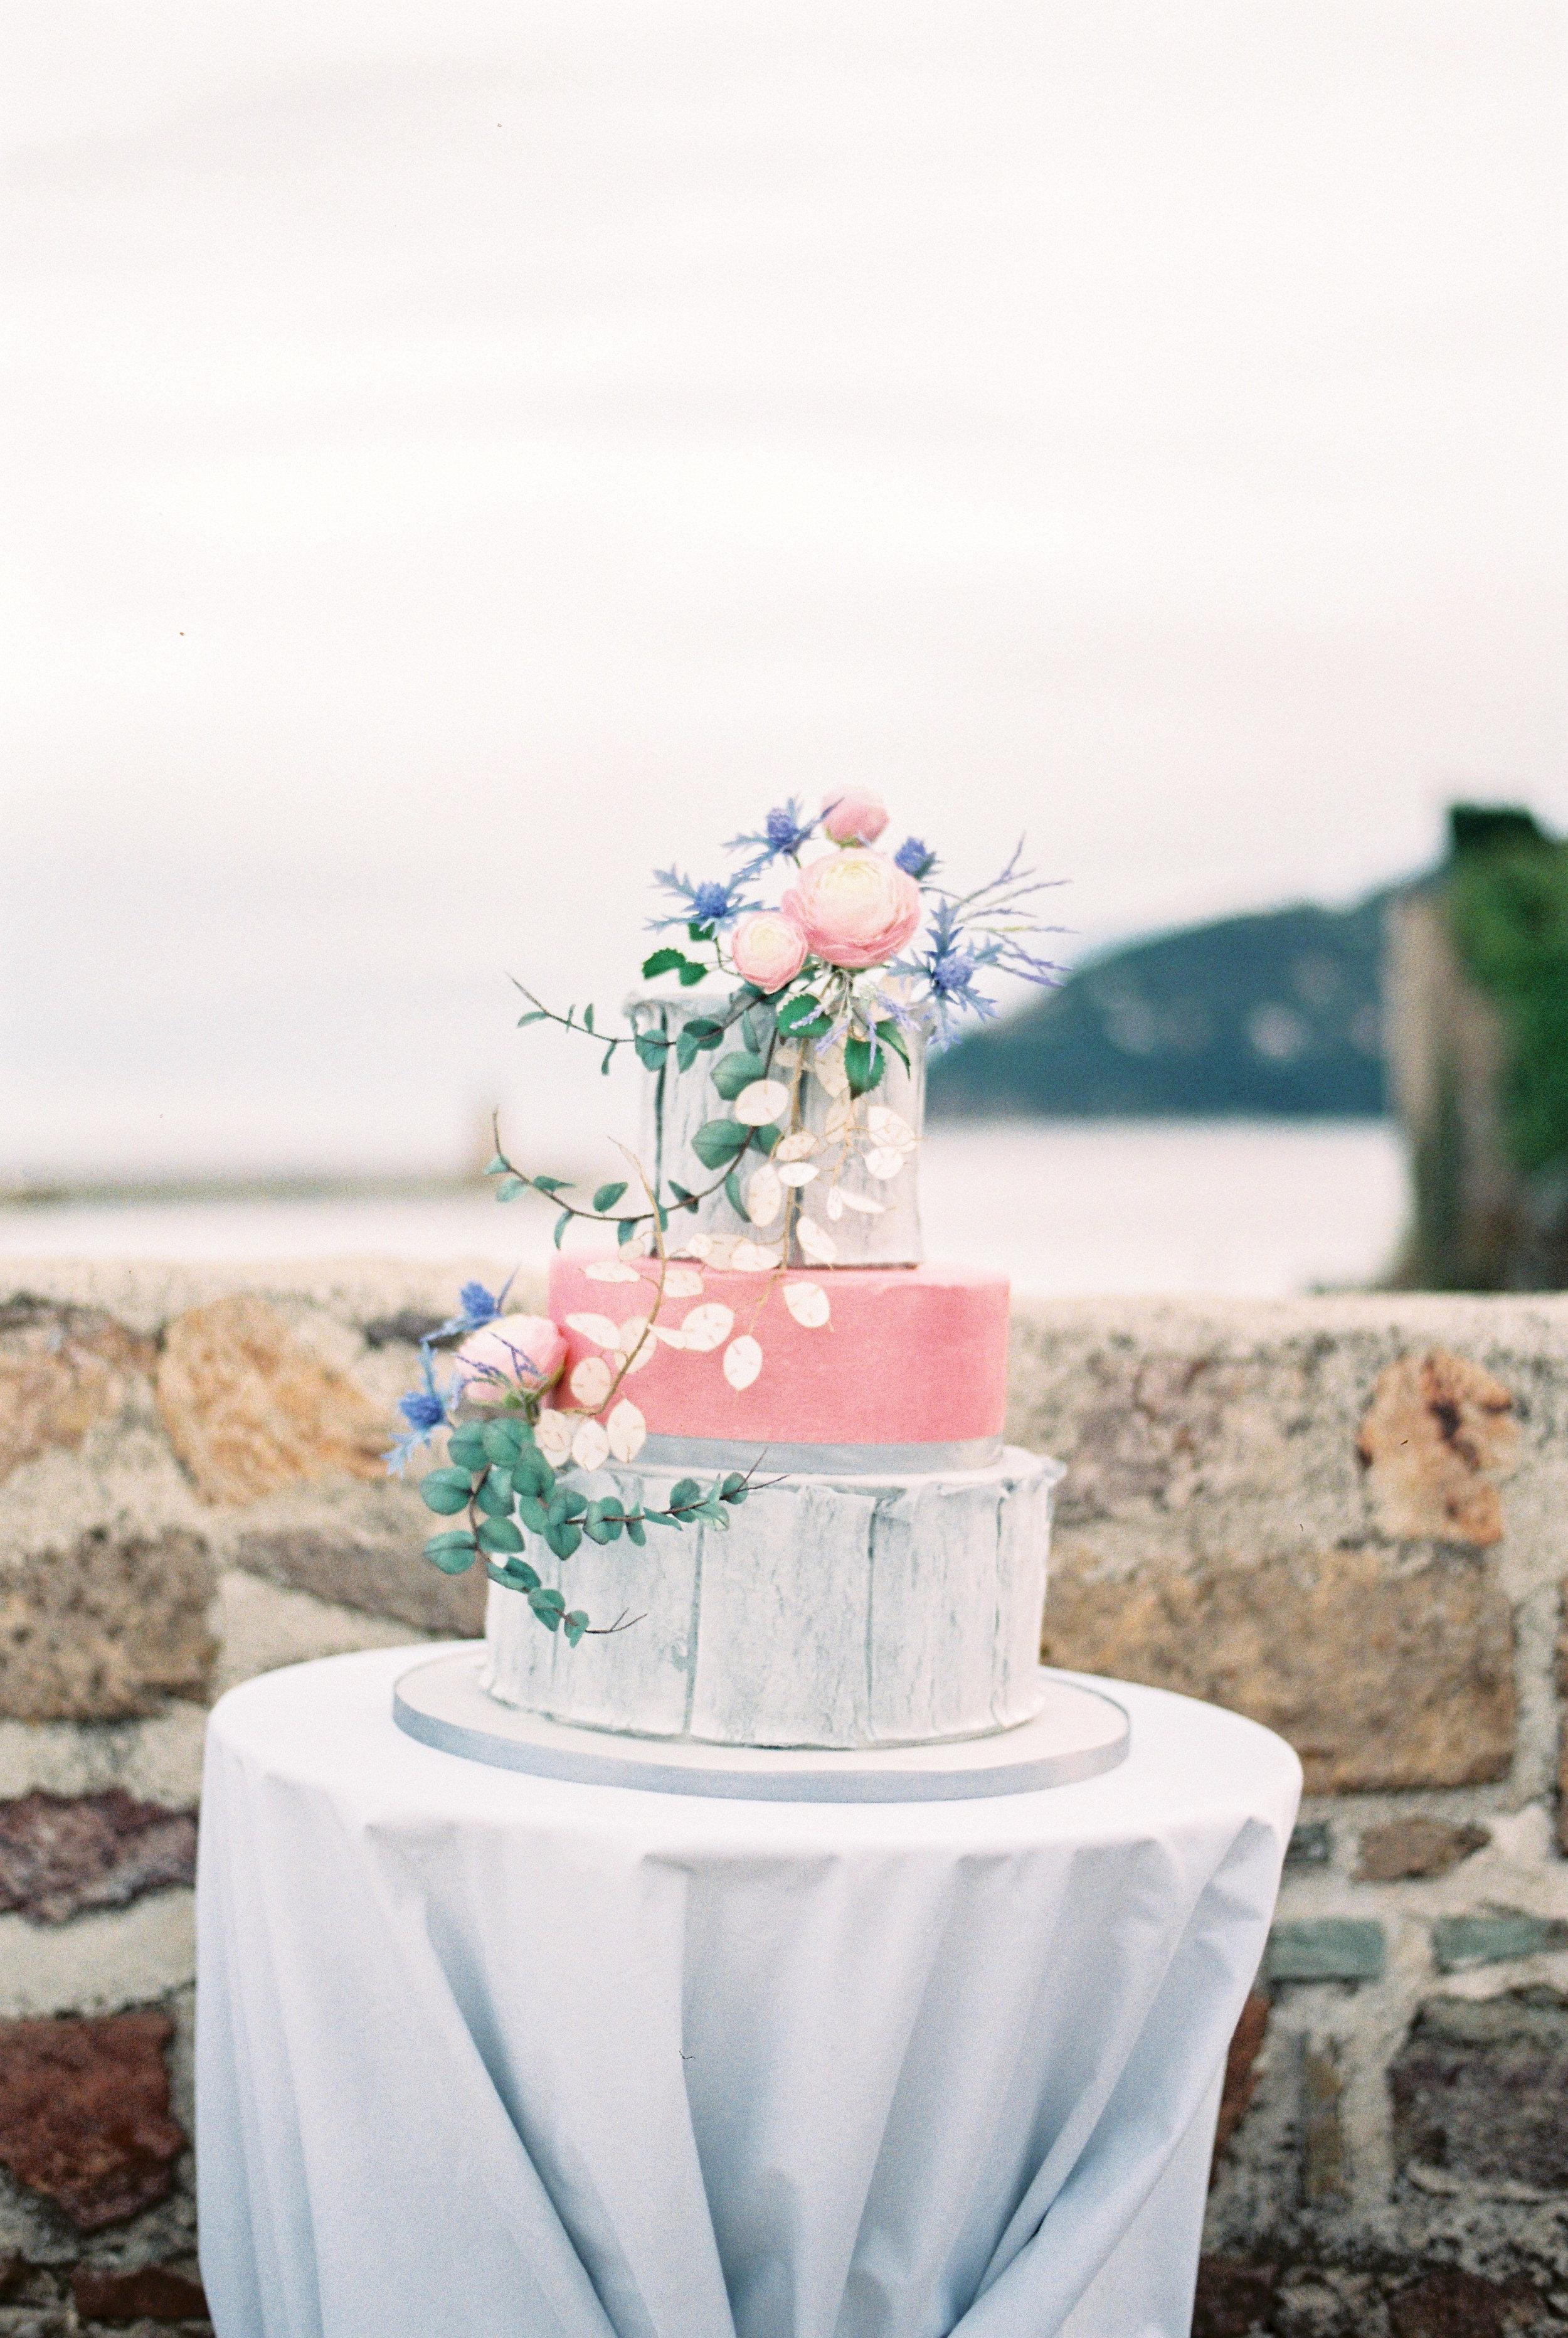 Wedding cake in chateau La napoule